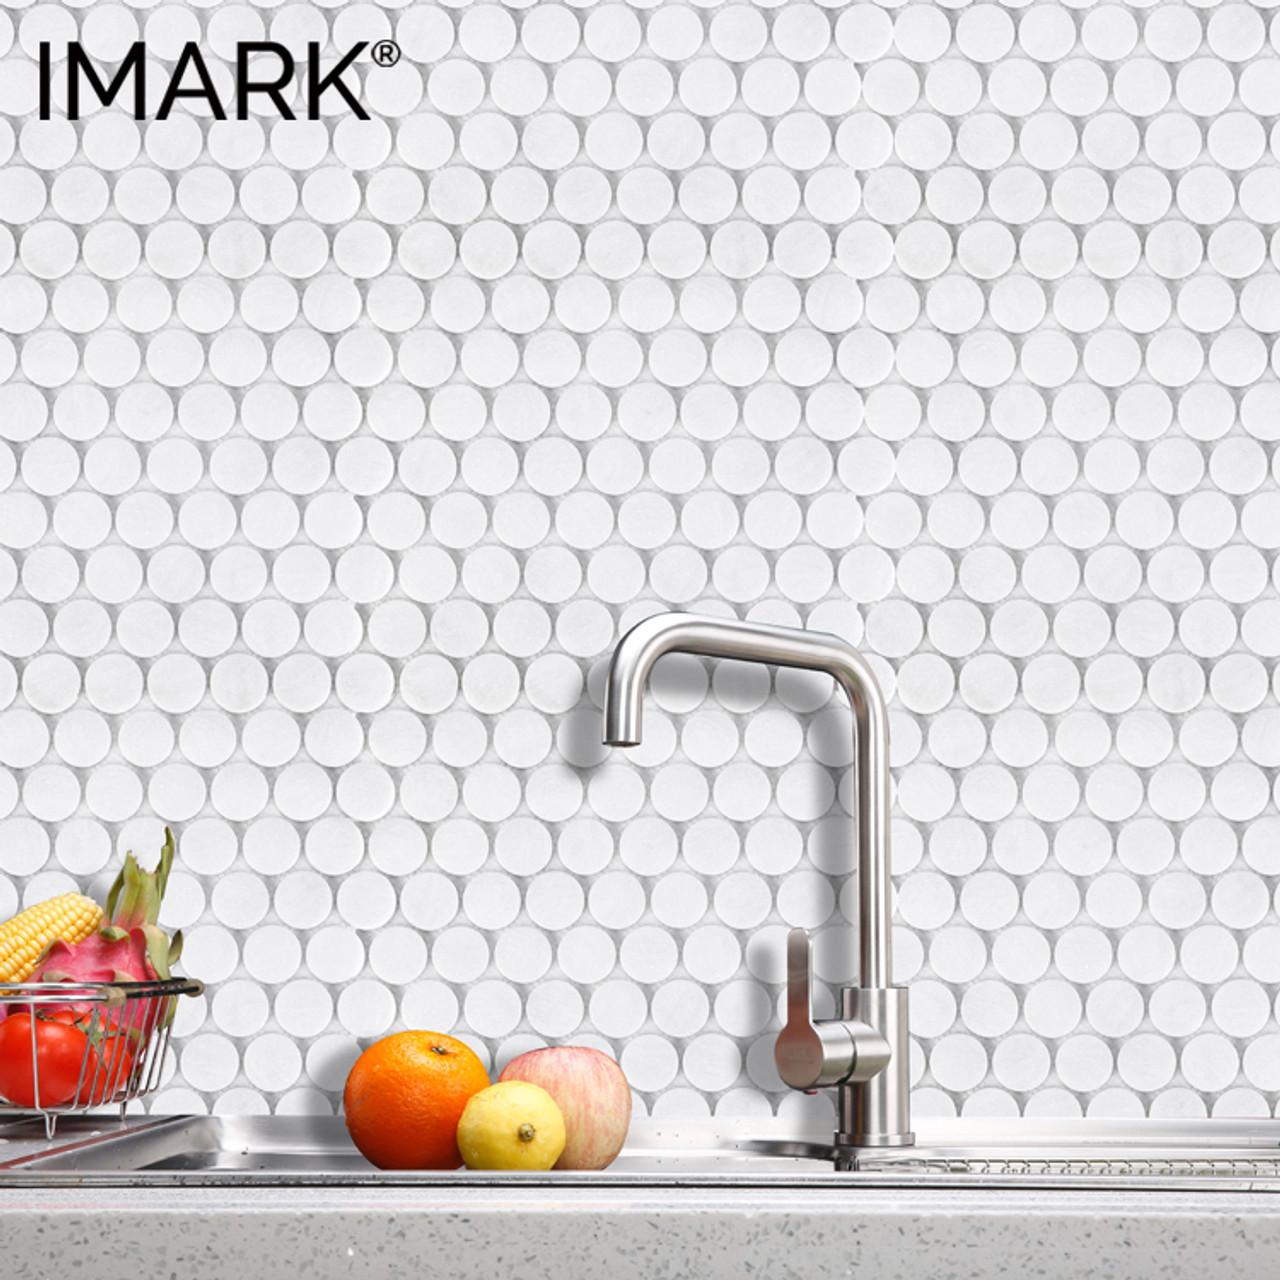 body glass tiles kitchen backsplash mosaic